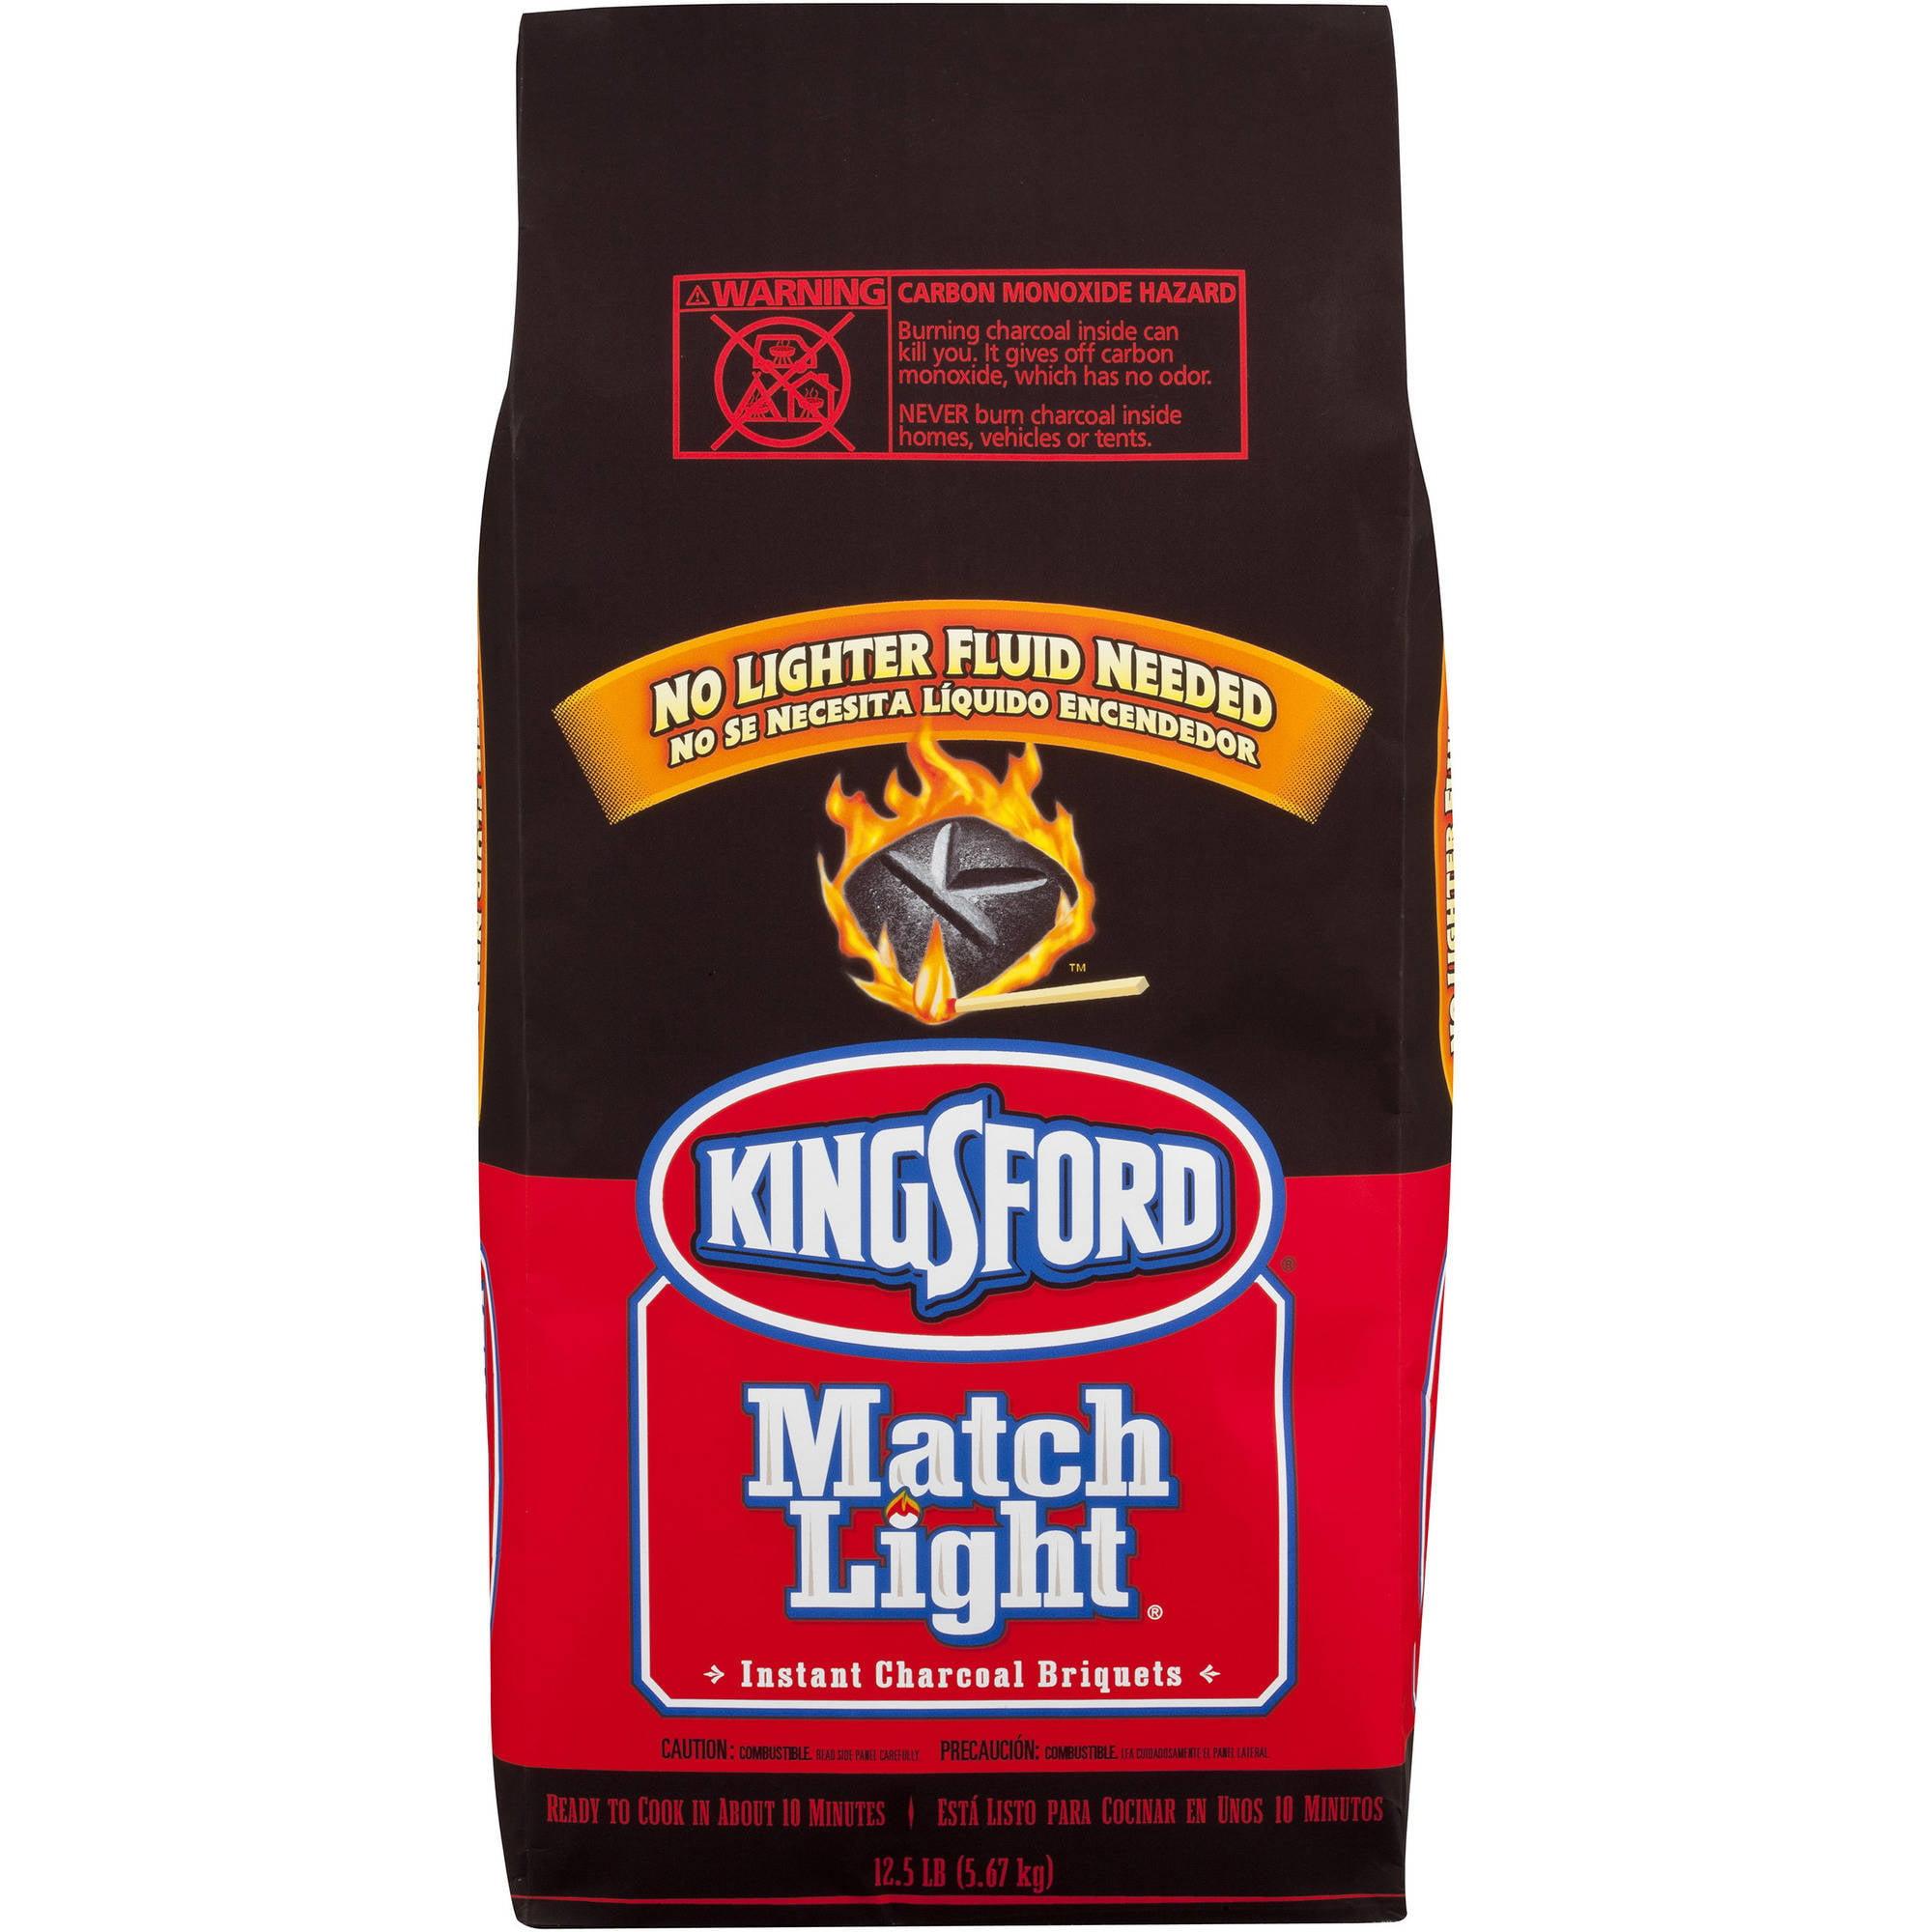 Kingsford Match Light Briquets, 12.50 lbs